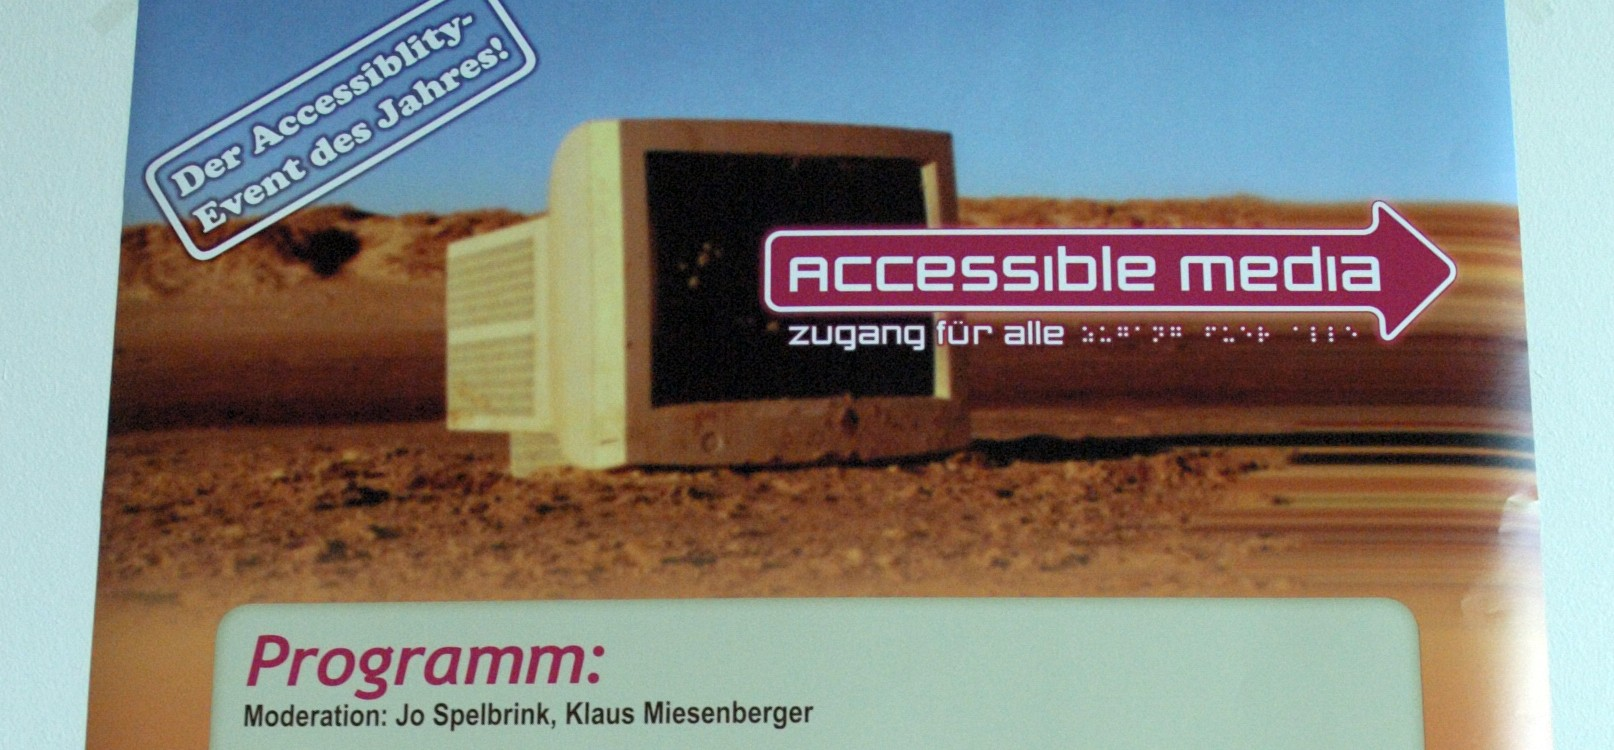 Veranstaltung accessible media 061012